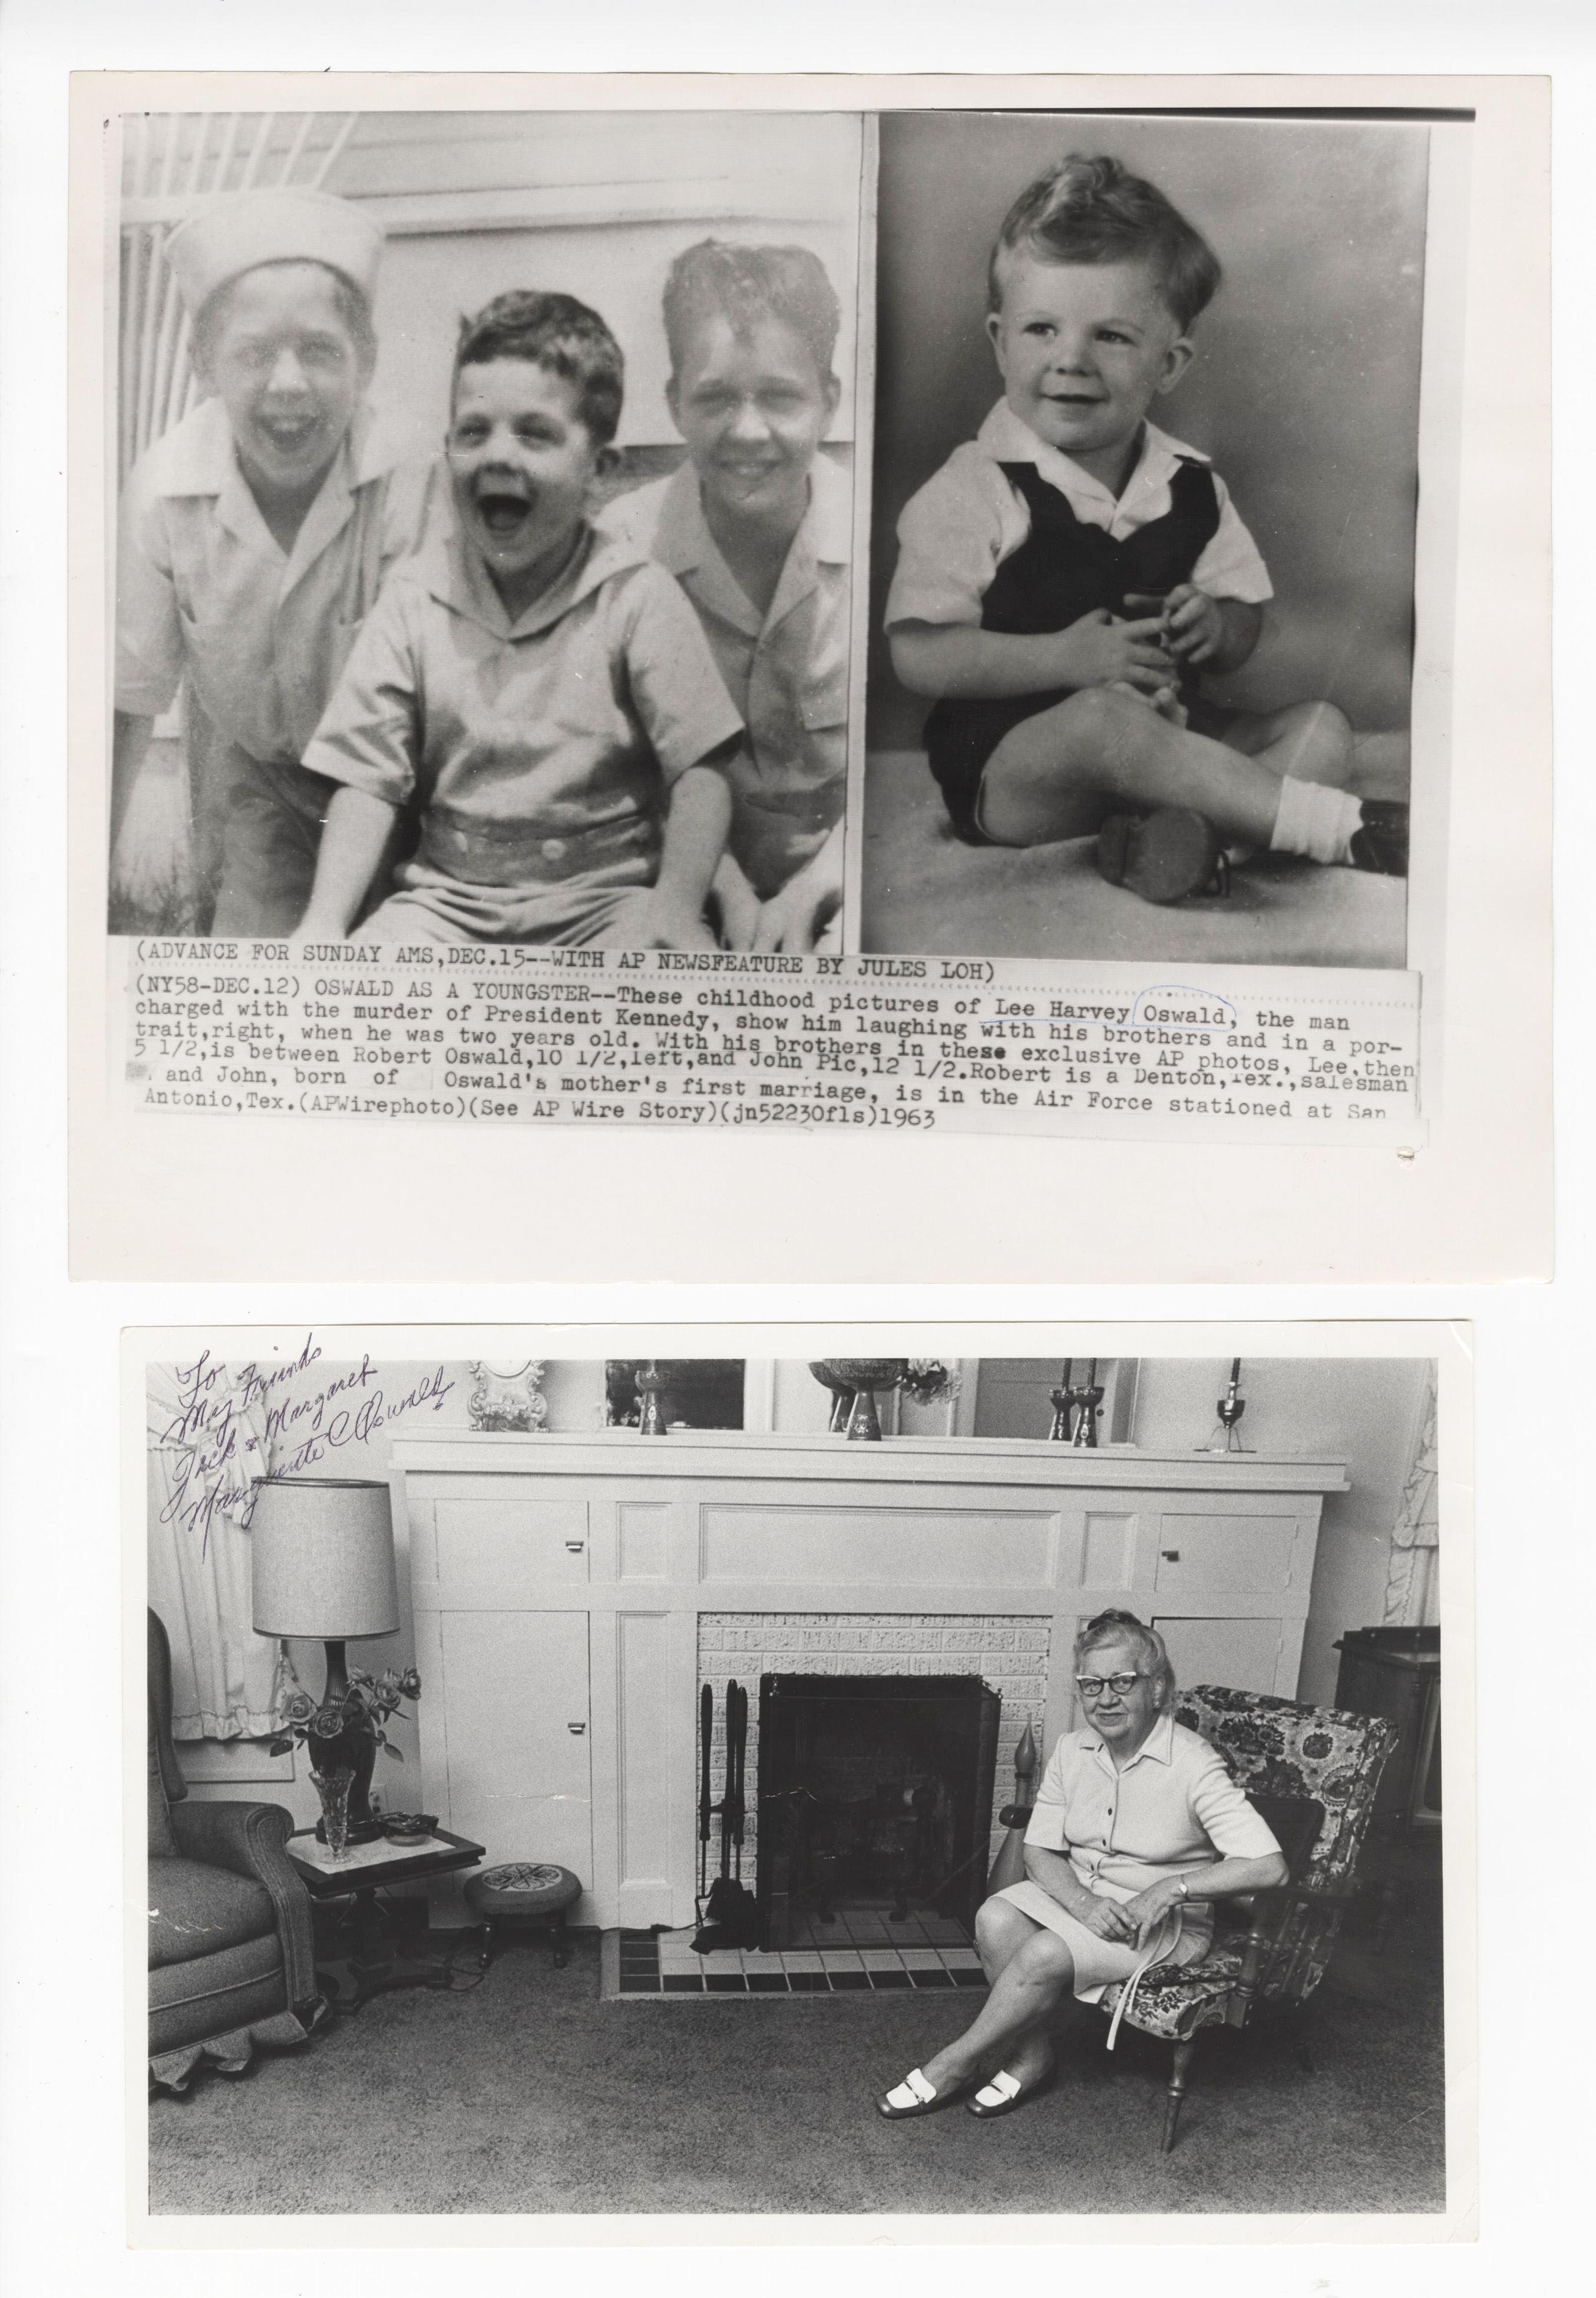 Lee Harvey Oswald And Mom Photographs